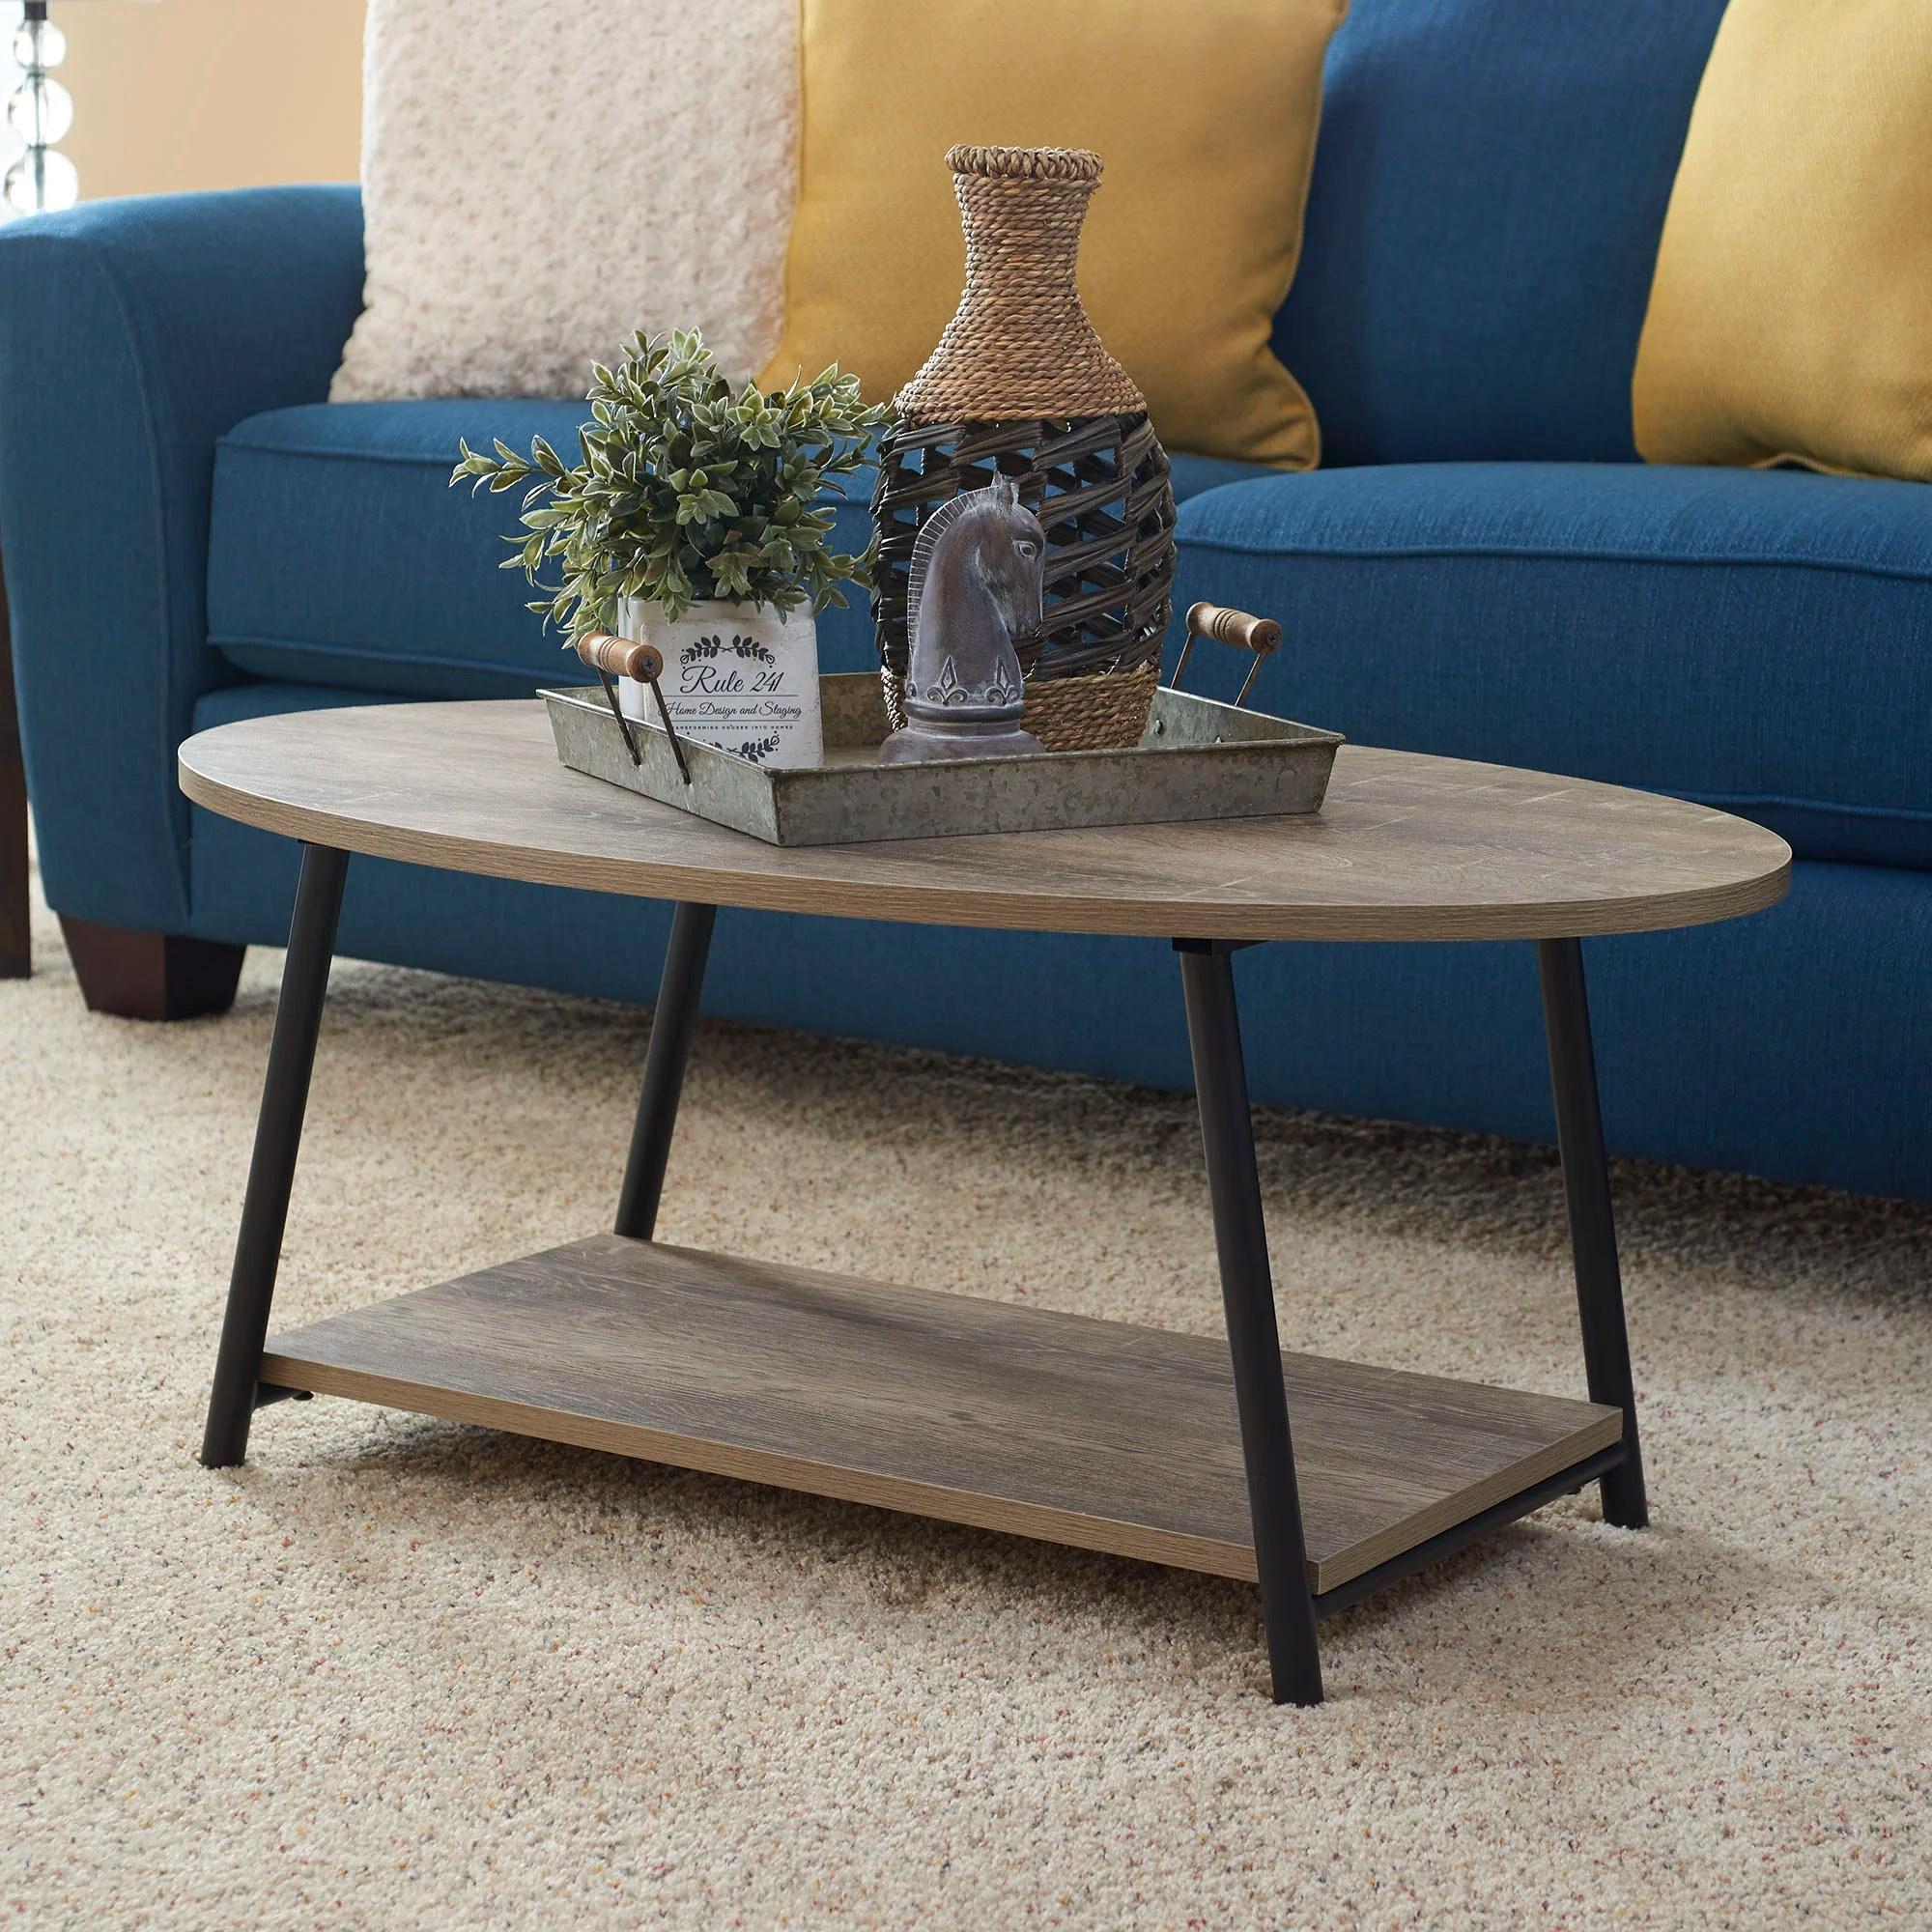 https www wayfair com furniture sb2 distressed finish rustic coffee tables c414602 a3724 9665 a3726 274118 html